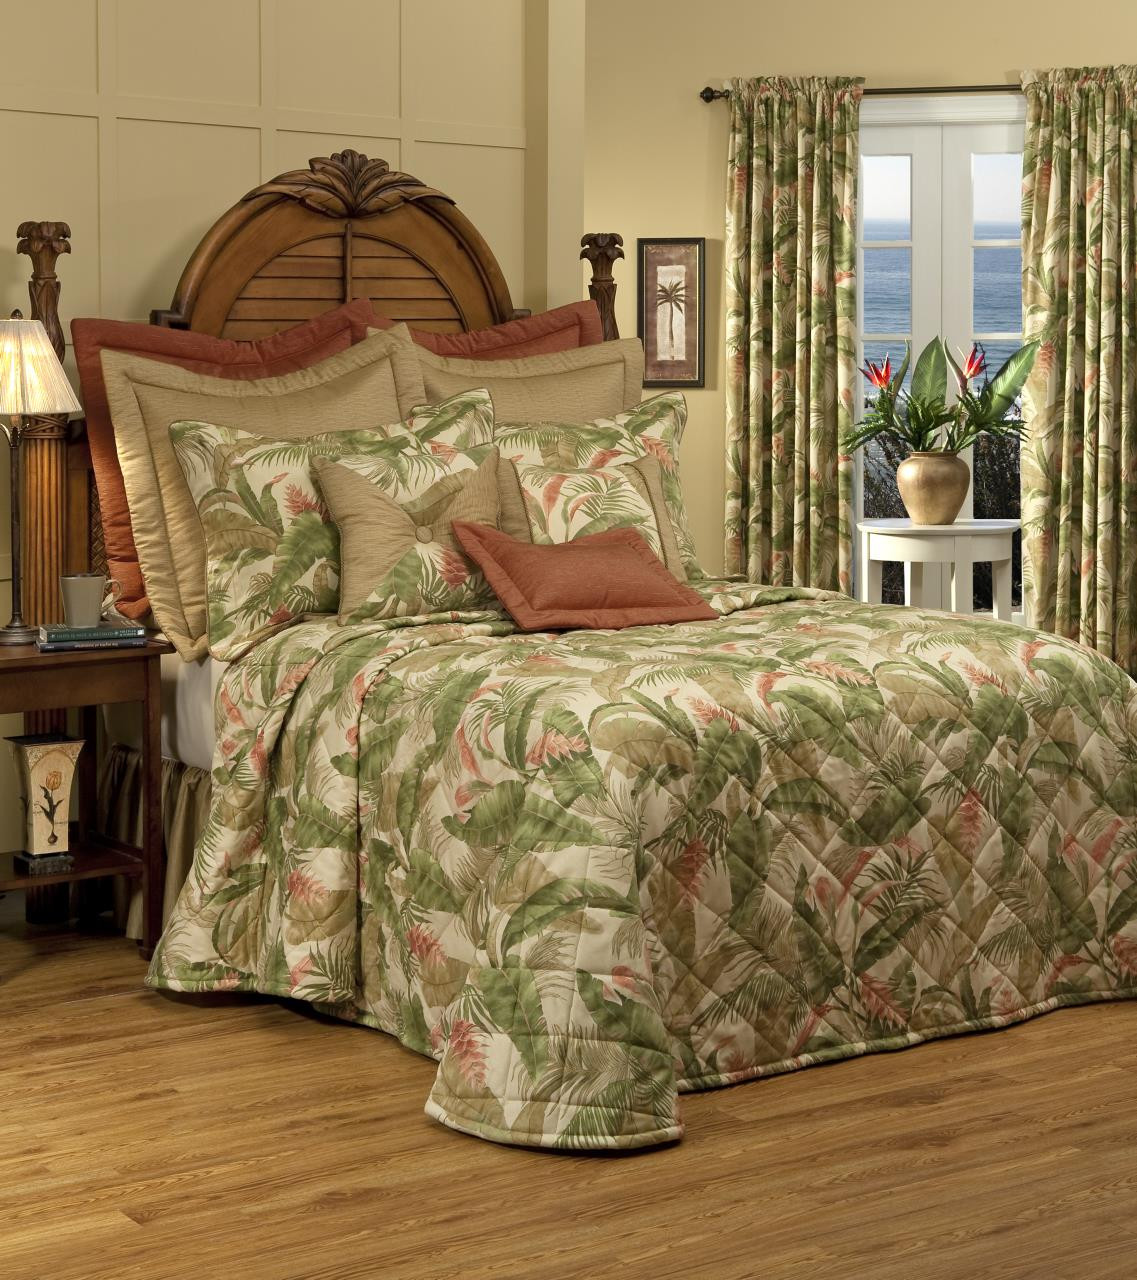 La Selva Natural Bedding Collection -